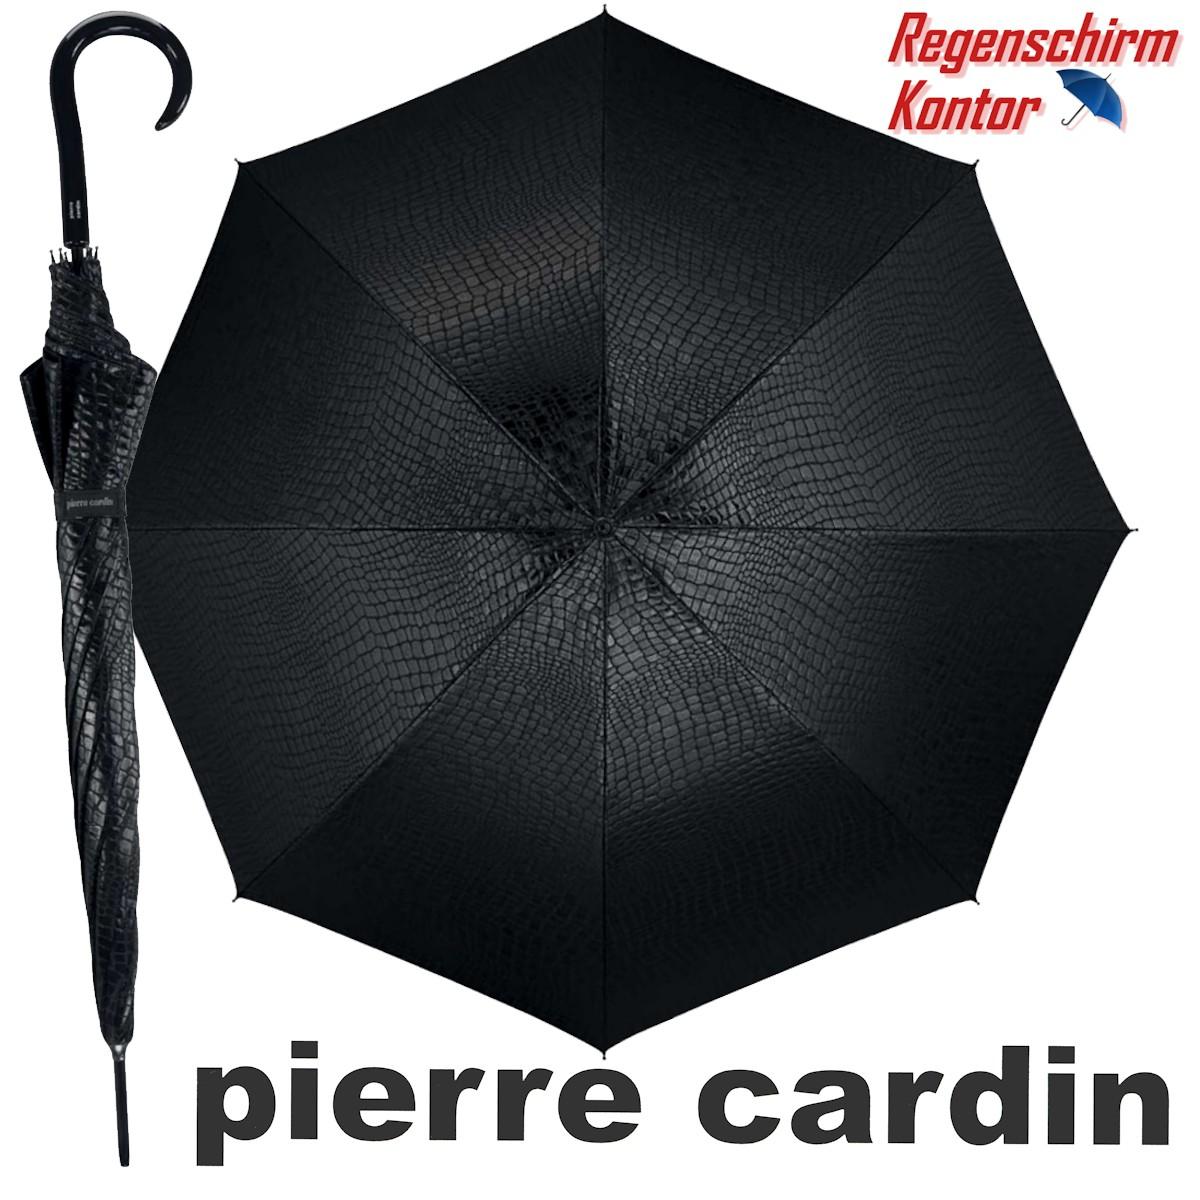 Regenschirm Stockschirm Damen Jacquard Pierre Cardin